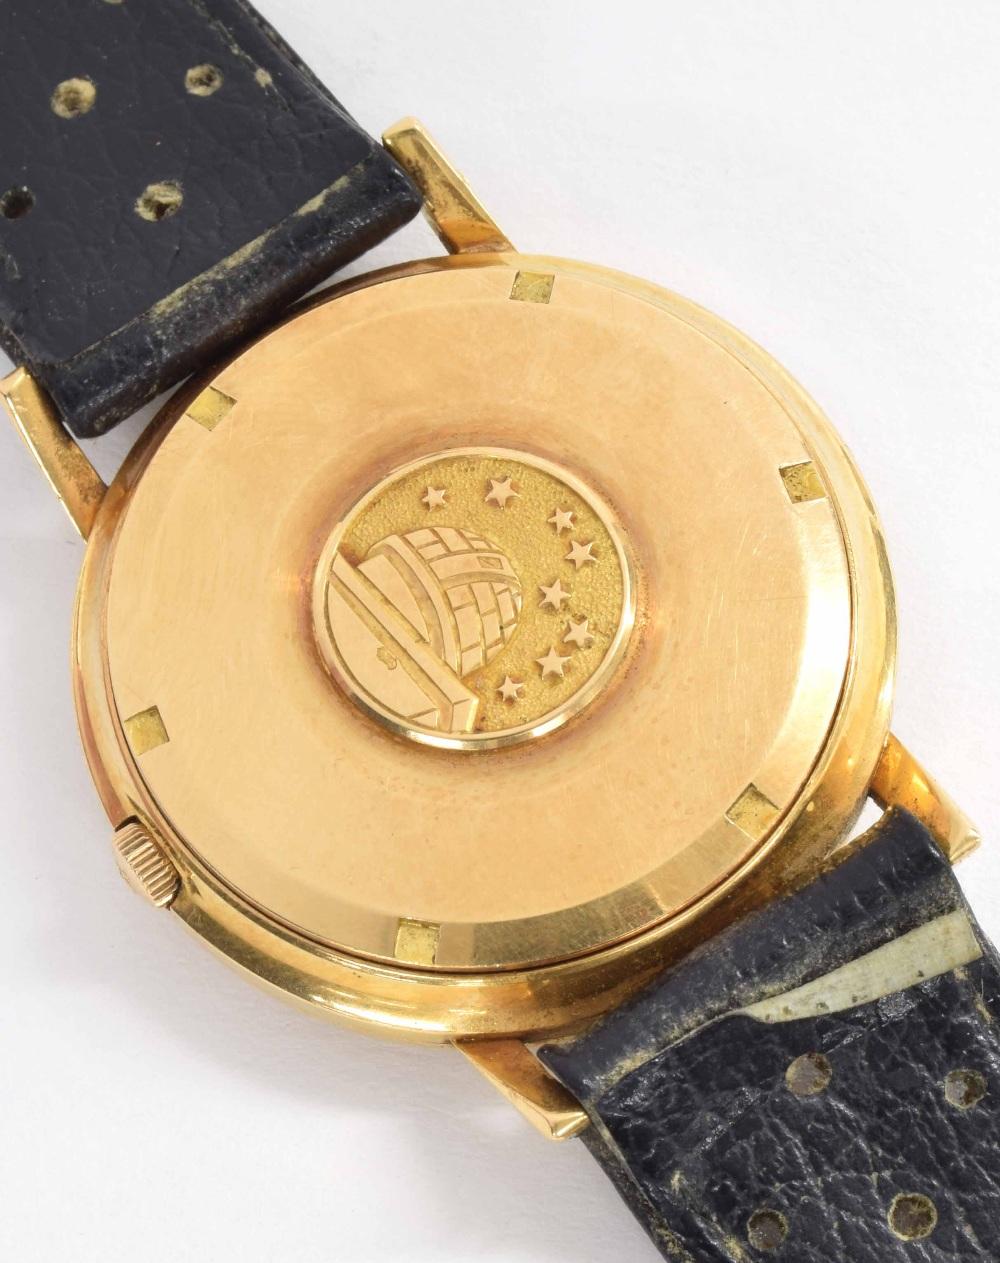 Lot 33 - Omega Constellation Chronometer automatic 18k gentleman's wristwatch, case ref. 1683004, circa 1964,